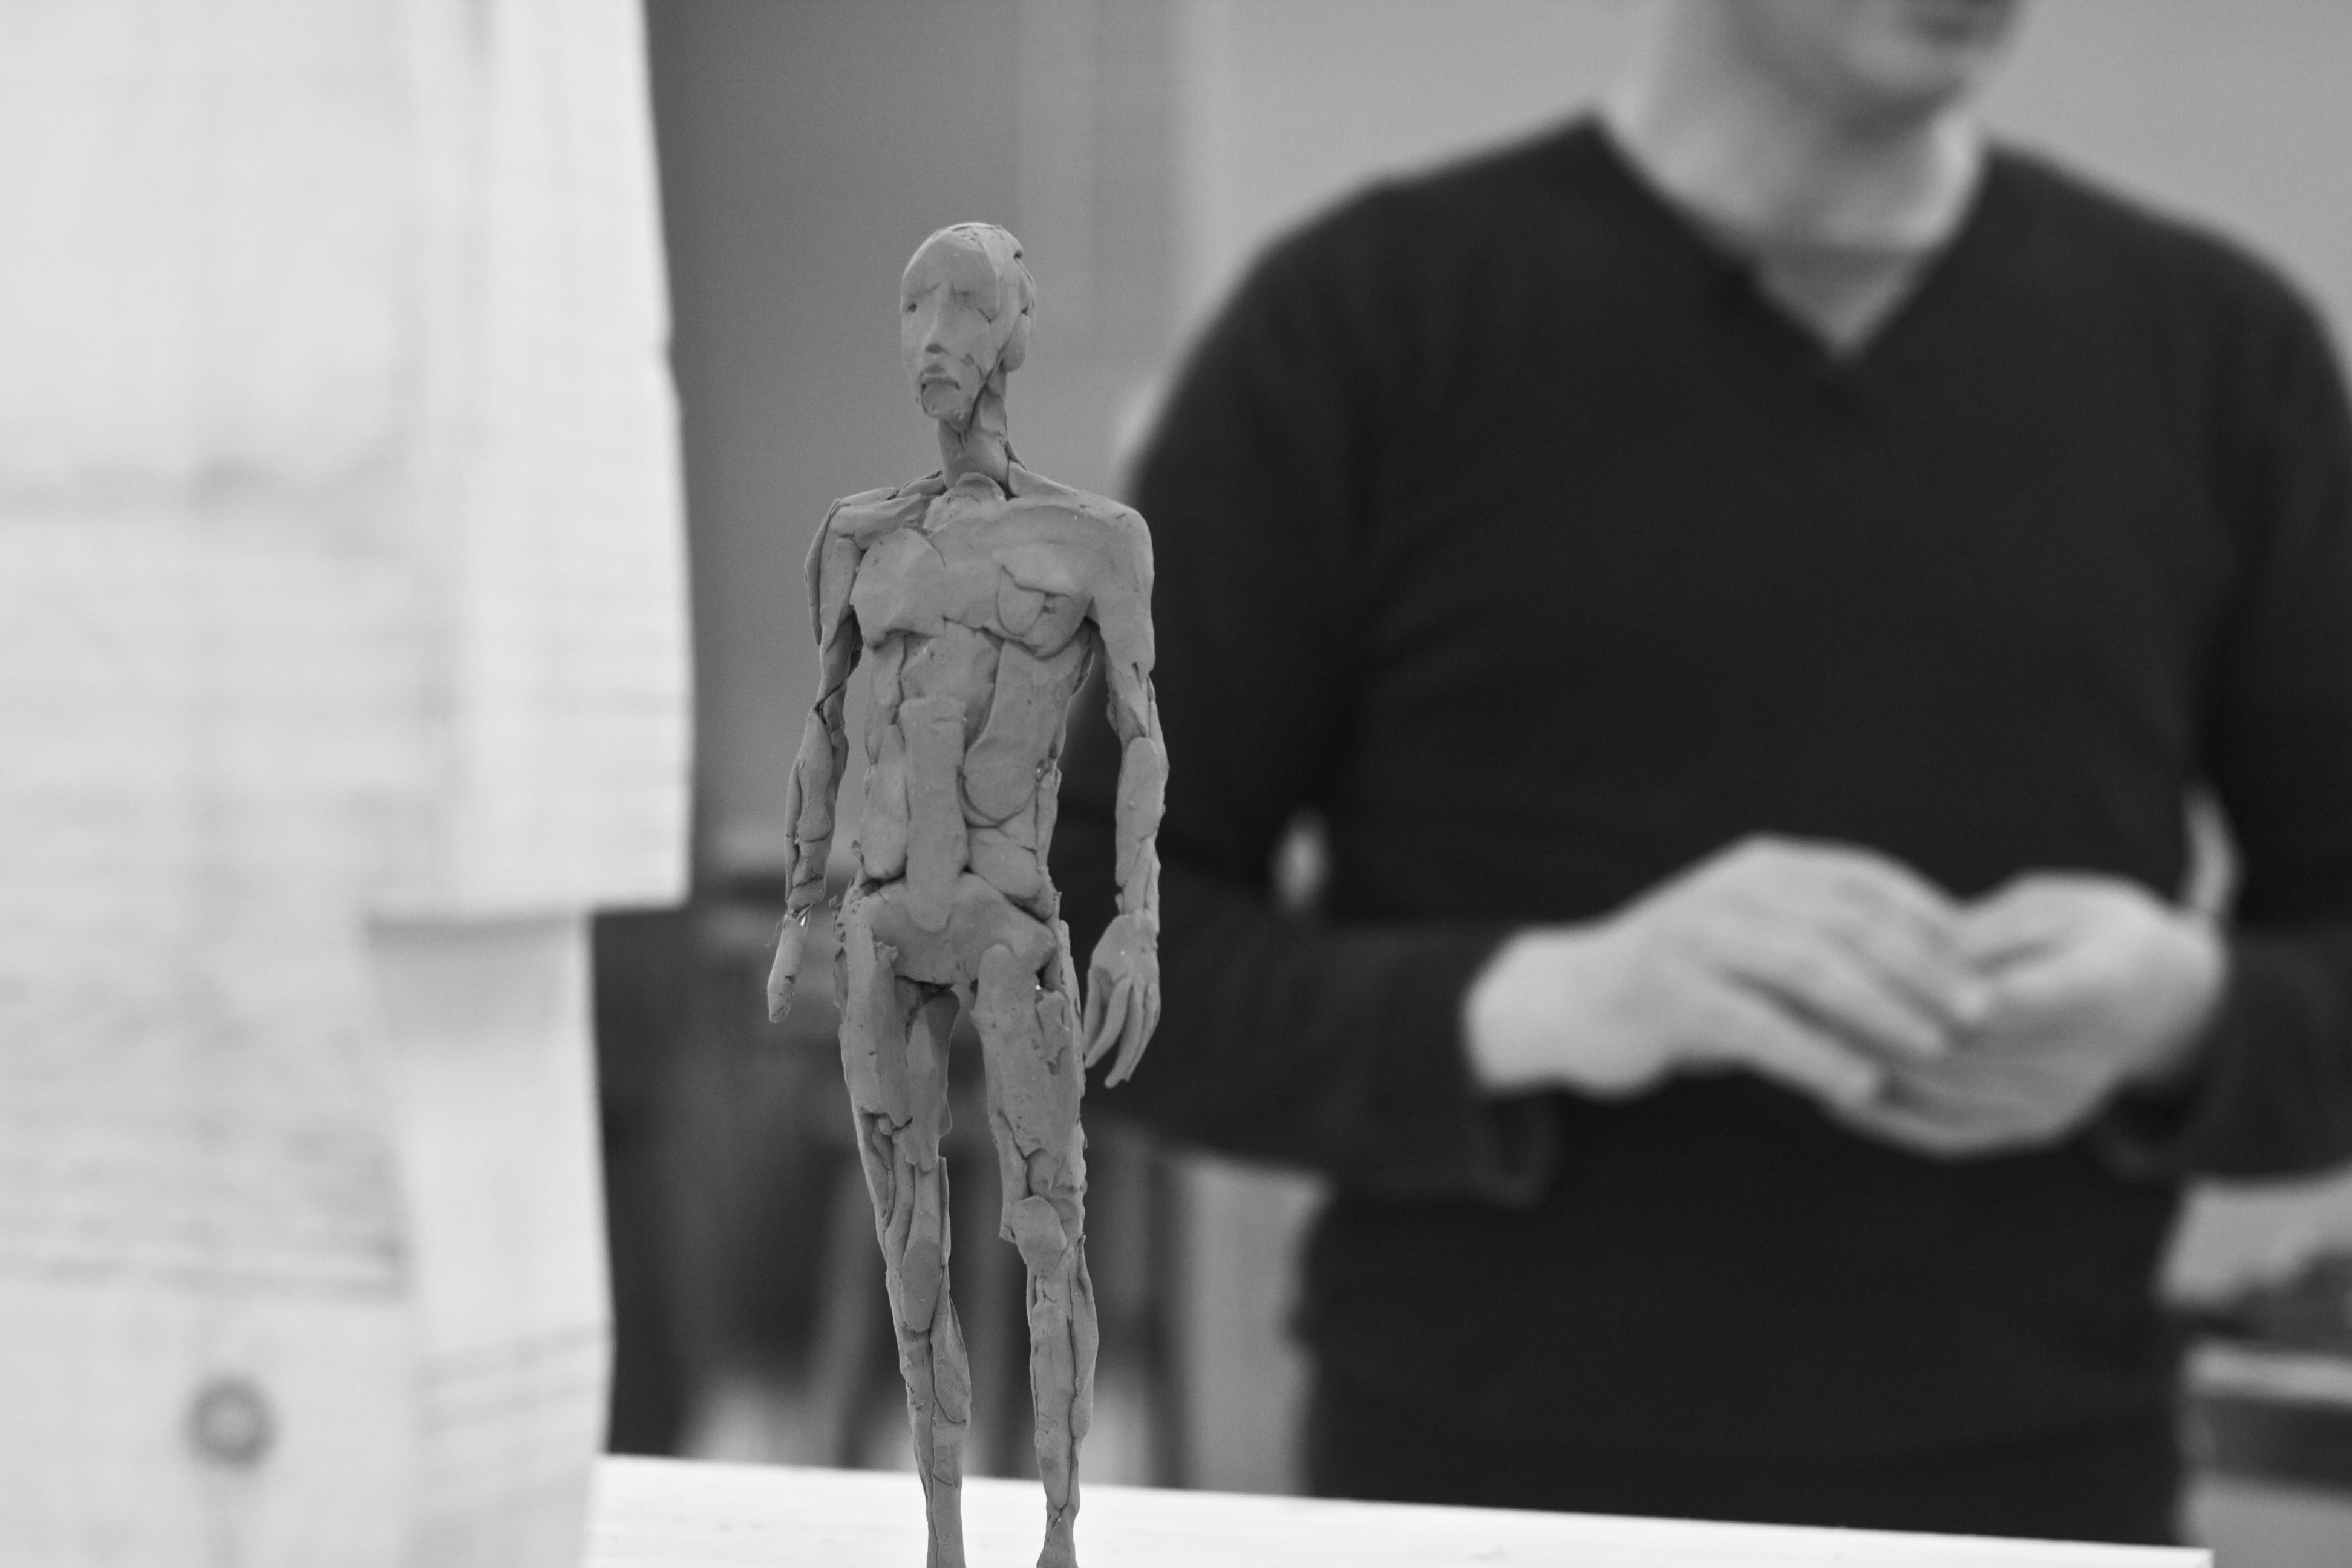 Flickr - Aron Demetz - Dialoghi e materia - Workshop a cura di Franco Reina44